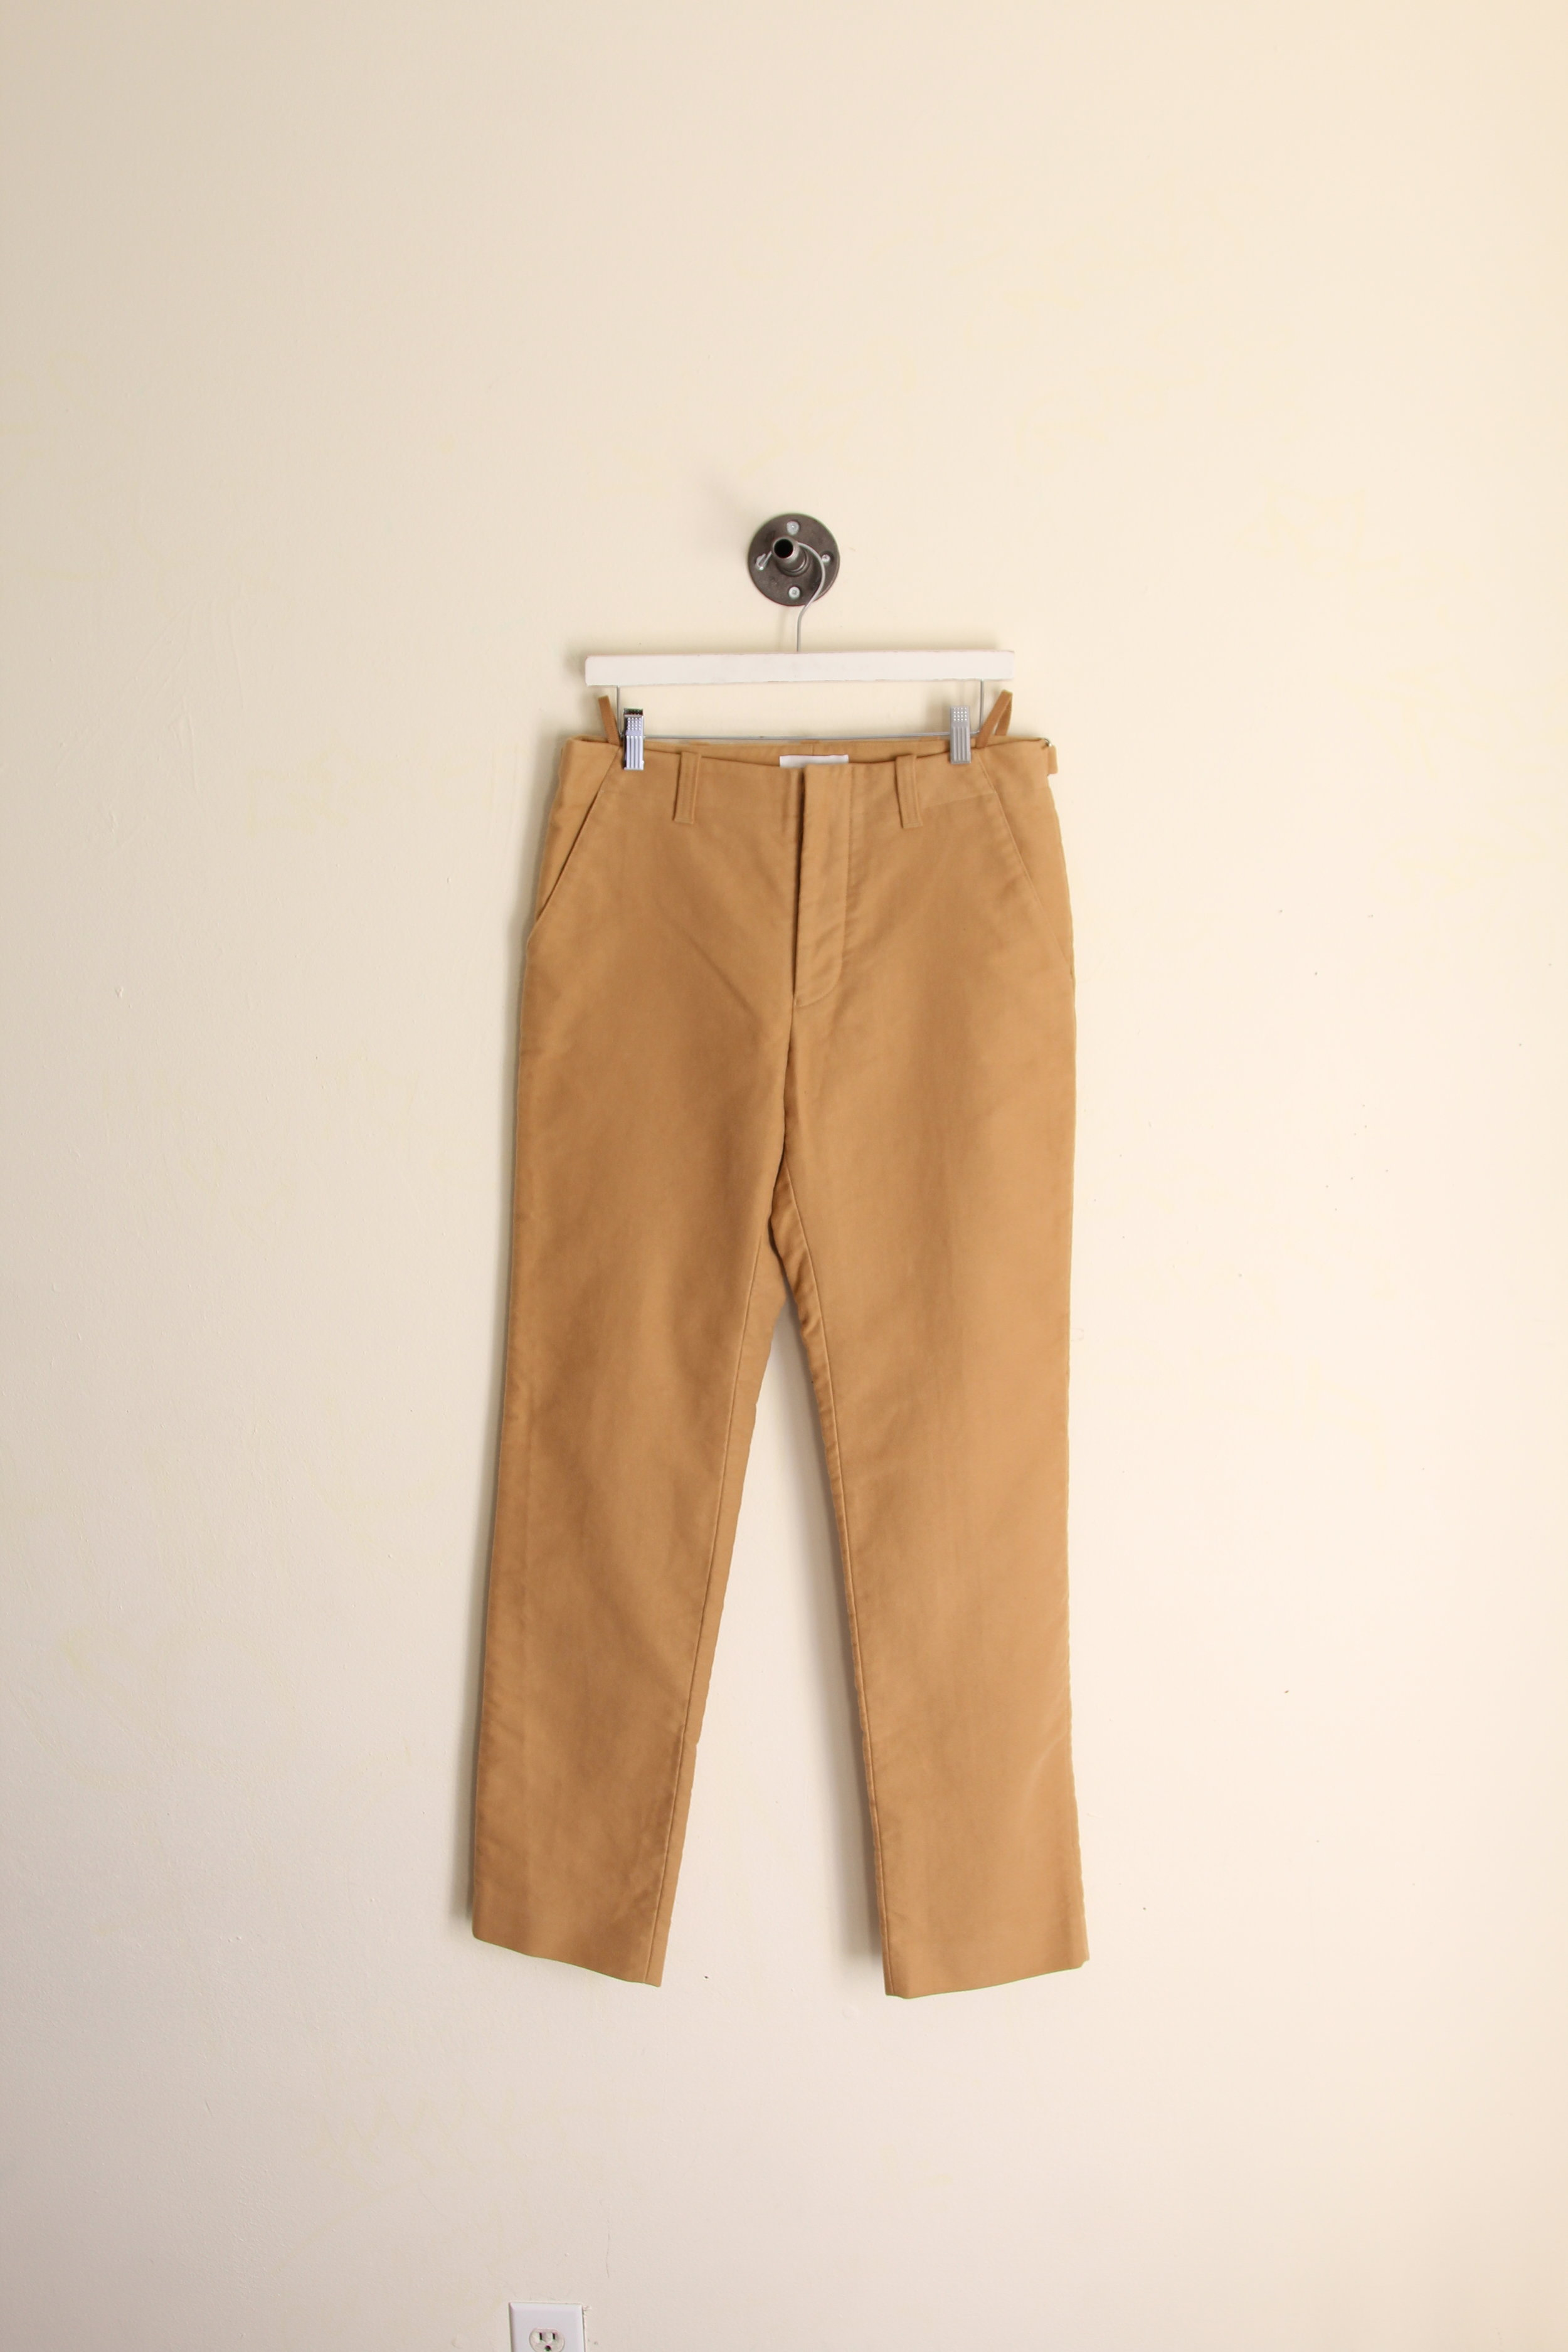 Helmut Lang AW 2004 Sample Moleskin Trousers